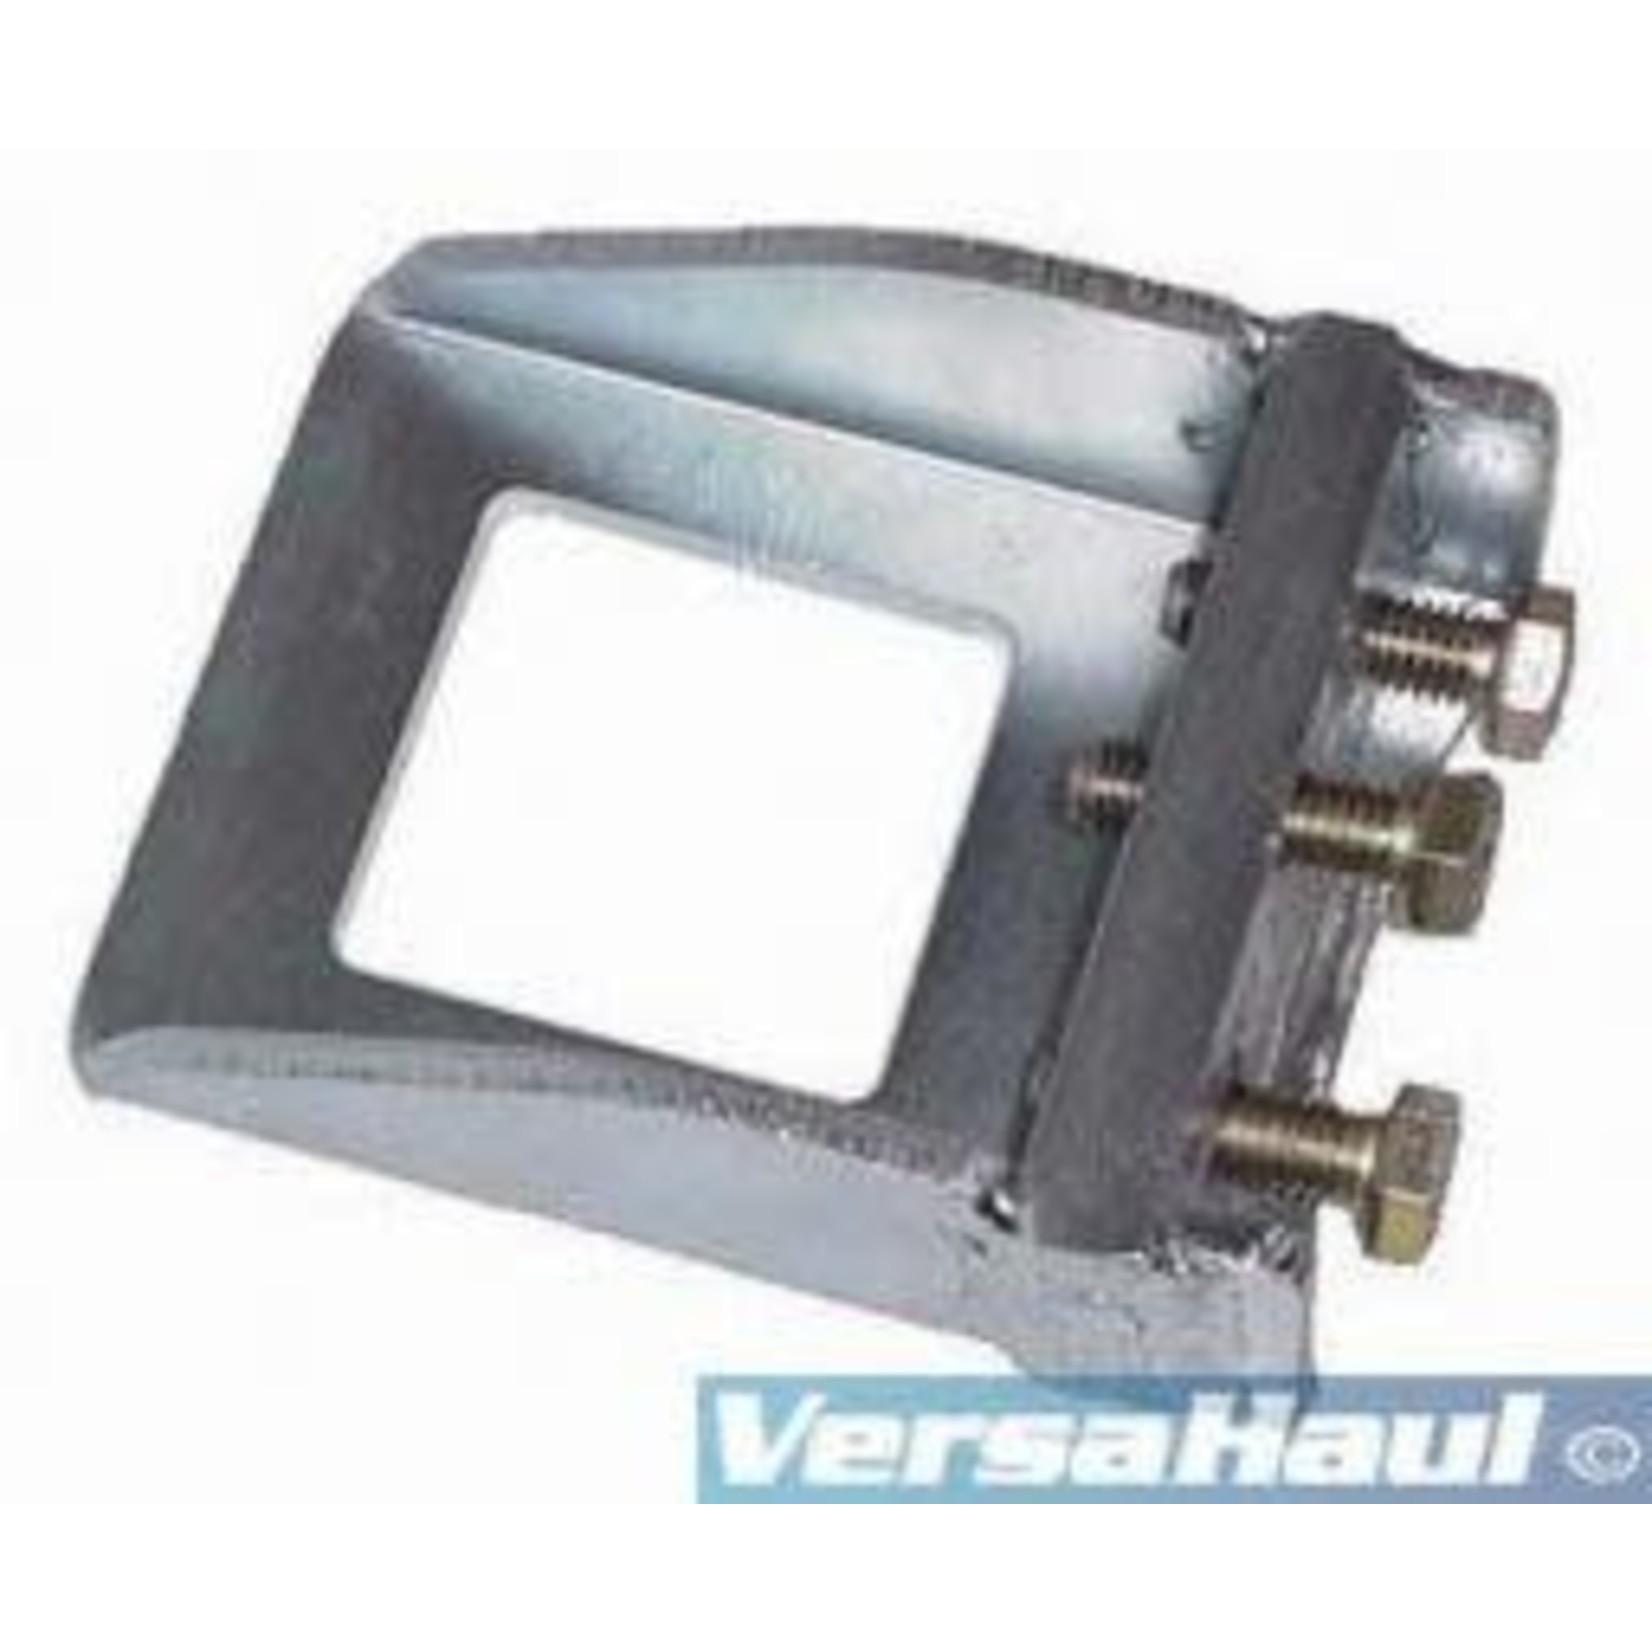 Accessories Versa Haul Anti Tilt Lock Bracket Heavy Duty